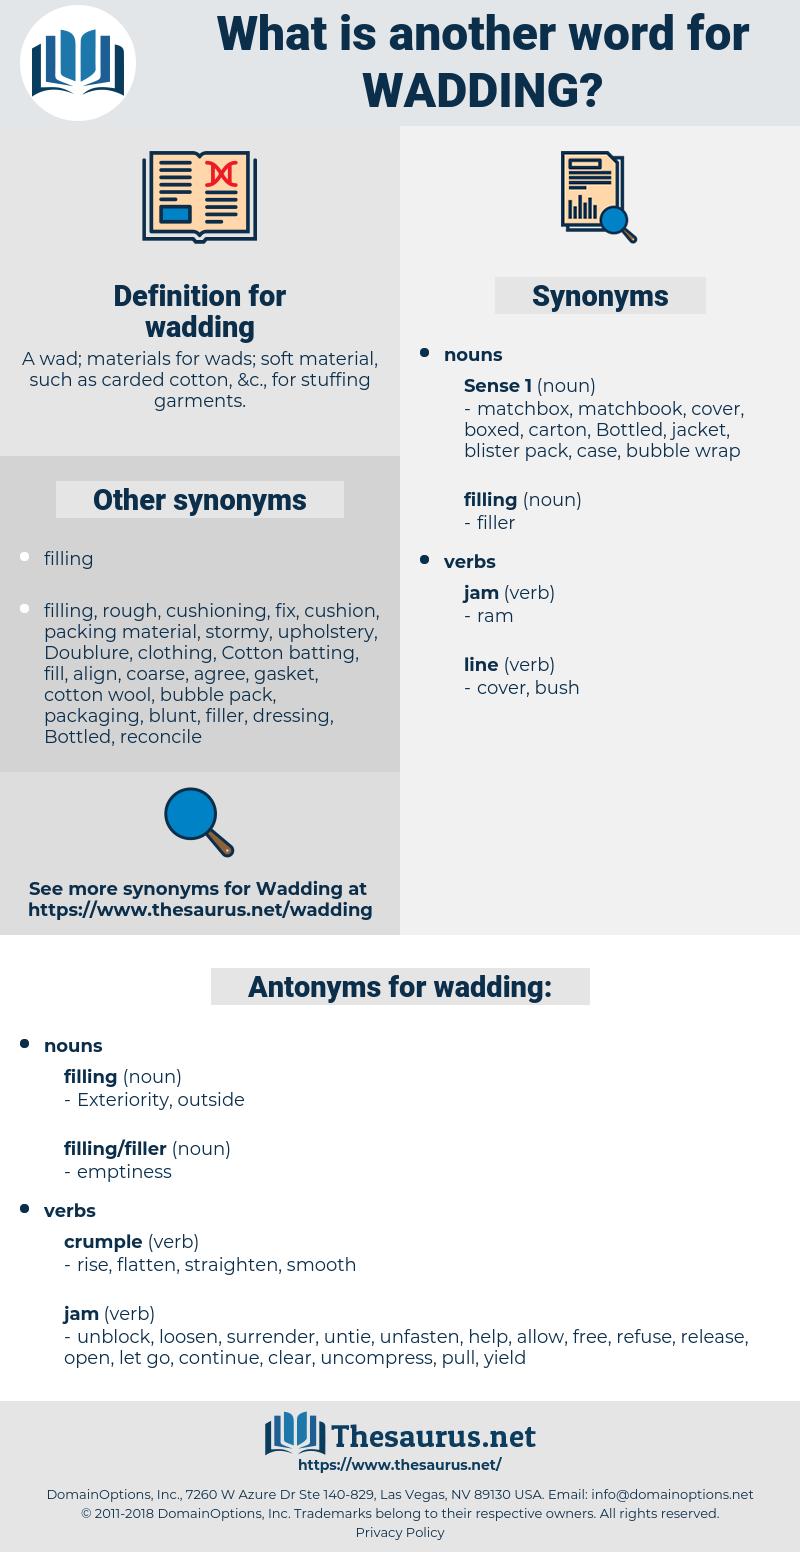 wadding, synonym wadding, another word for wadding, words like wadding, thesaurus wadding